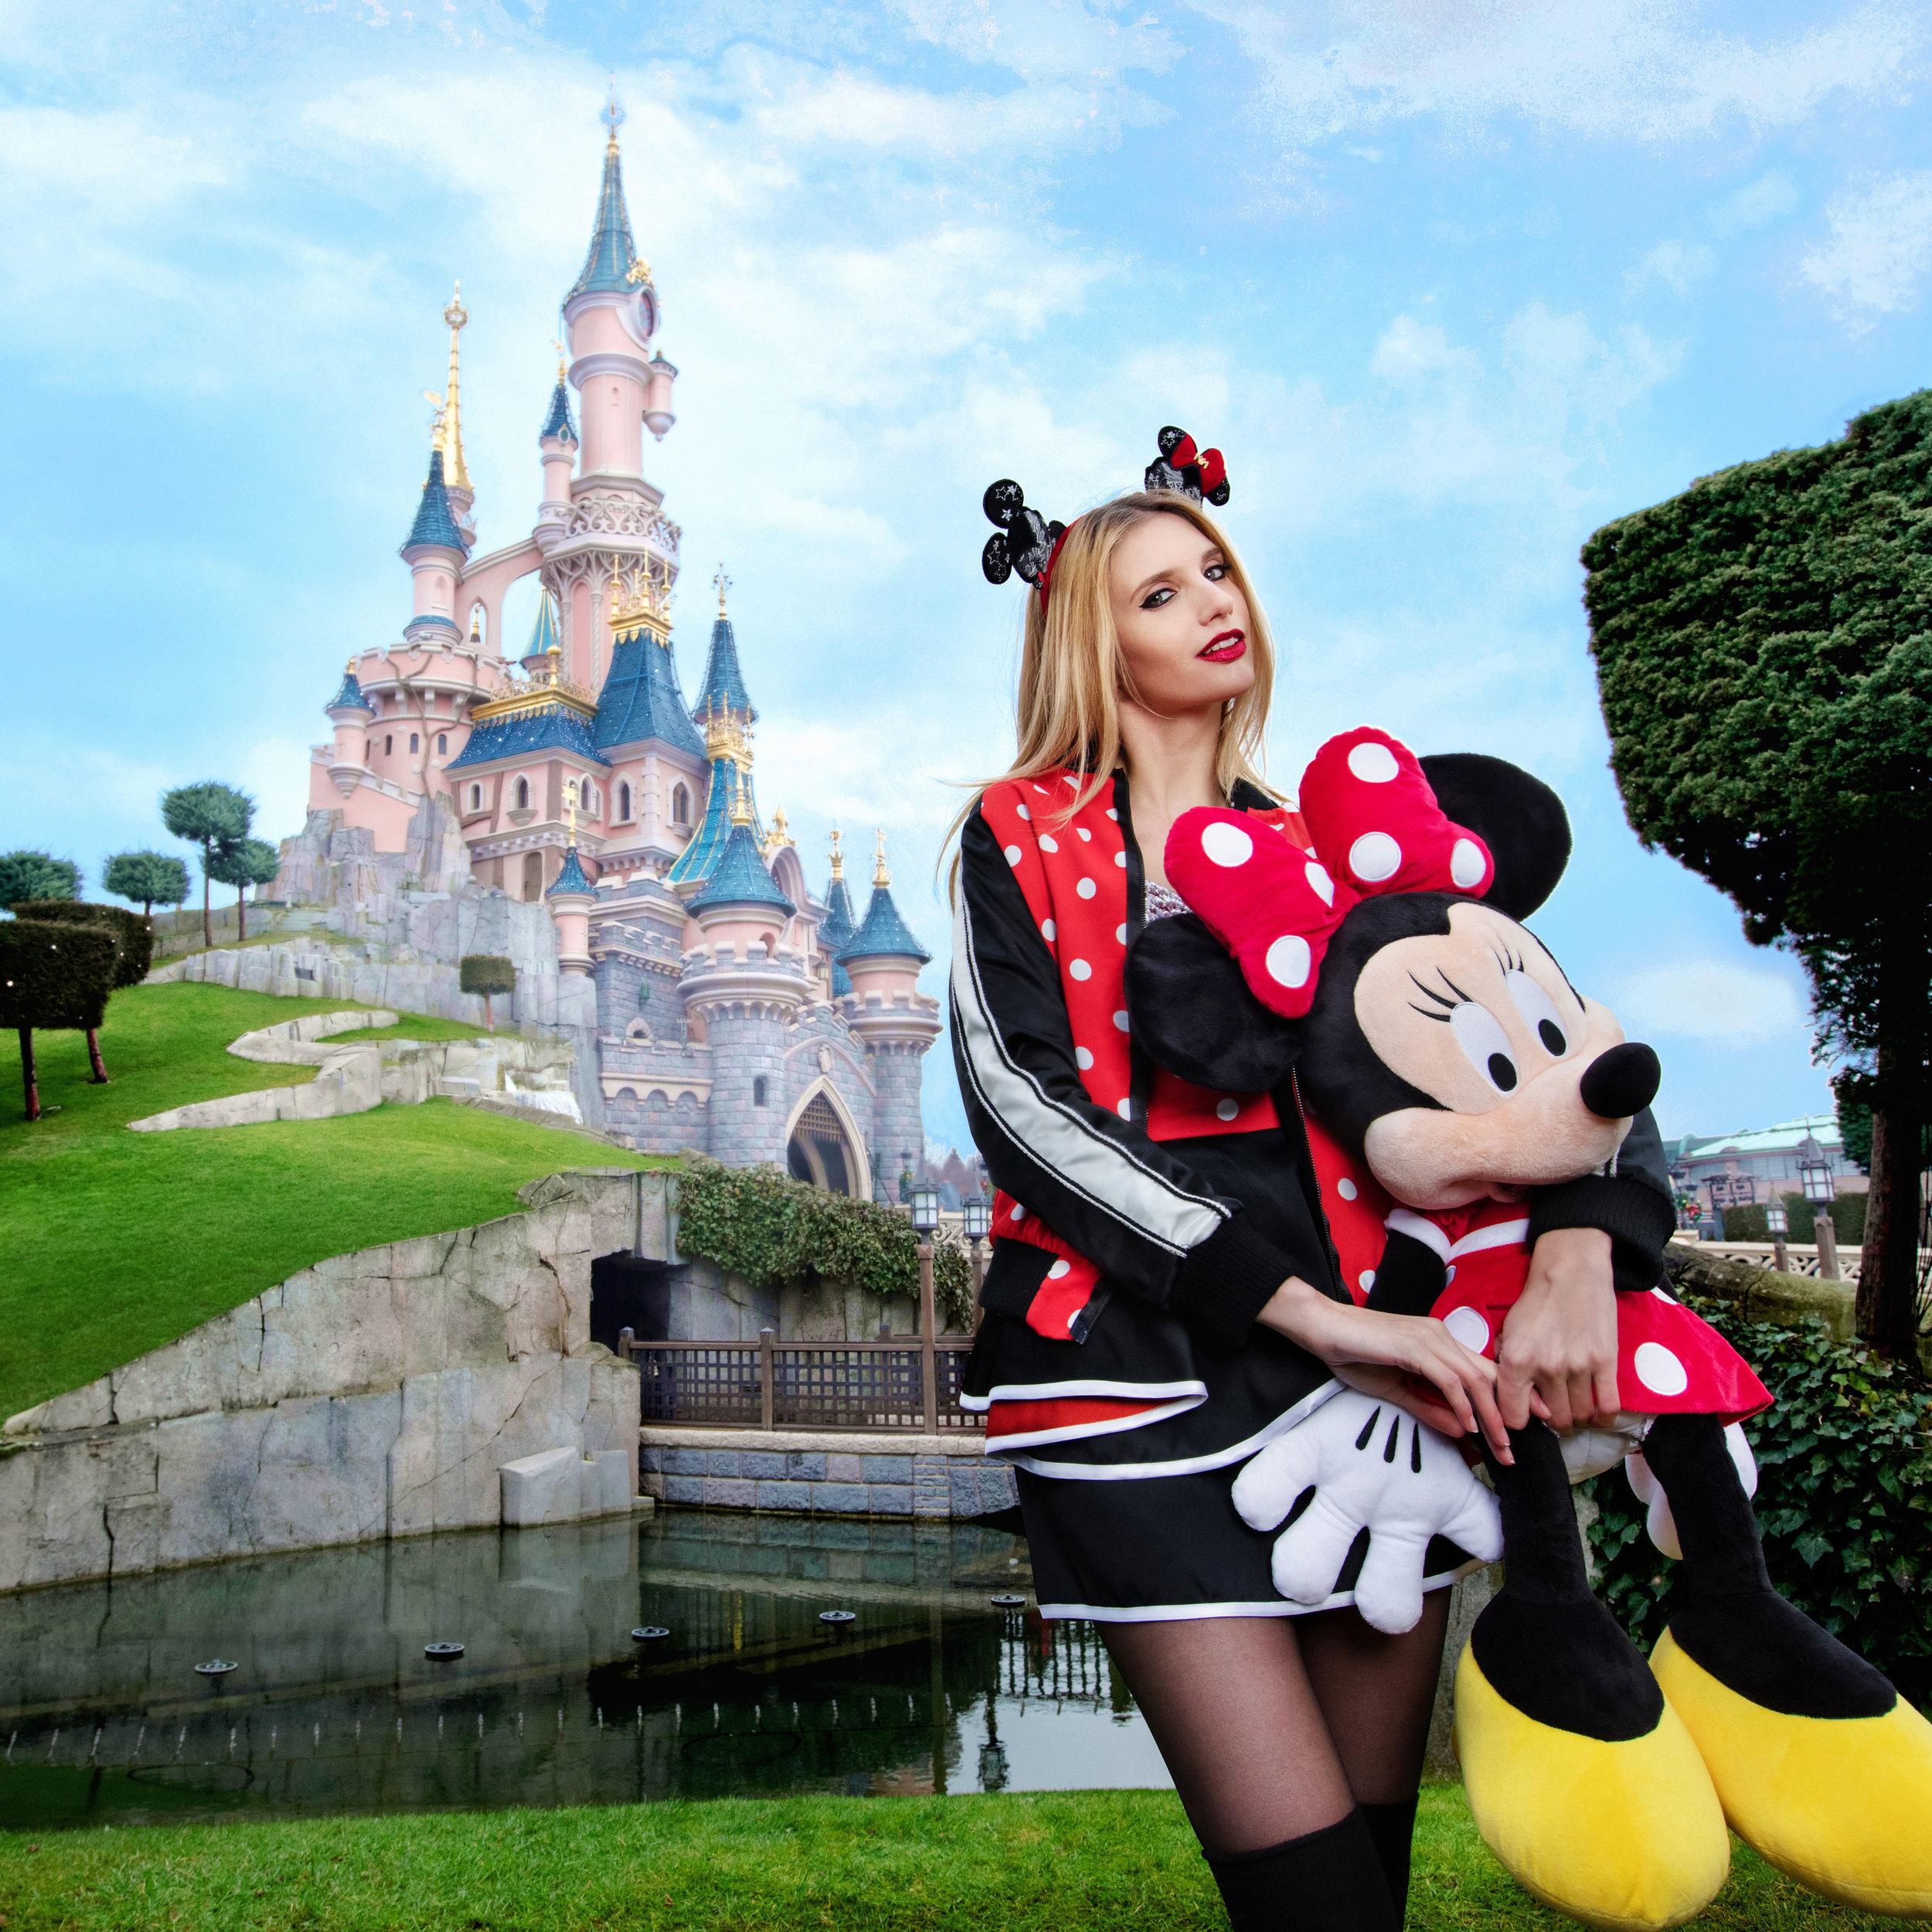 Disneyland Paris - 25ème anniversaire de DisneyLand Paris